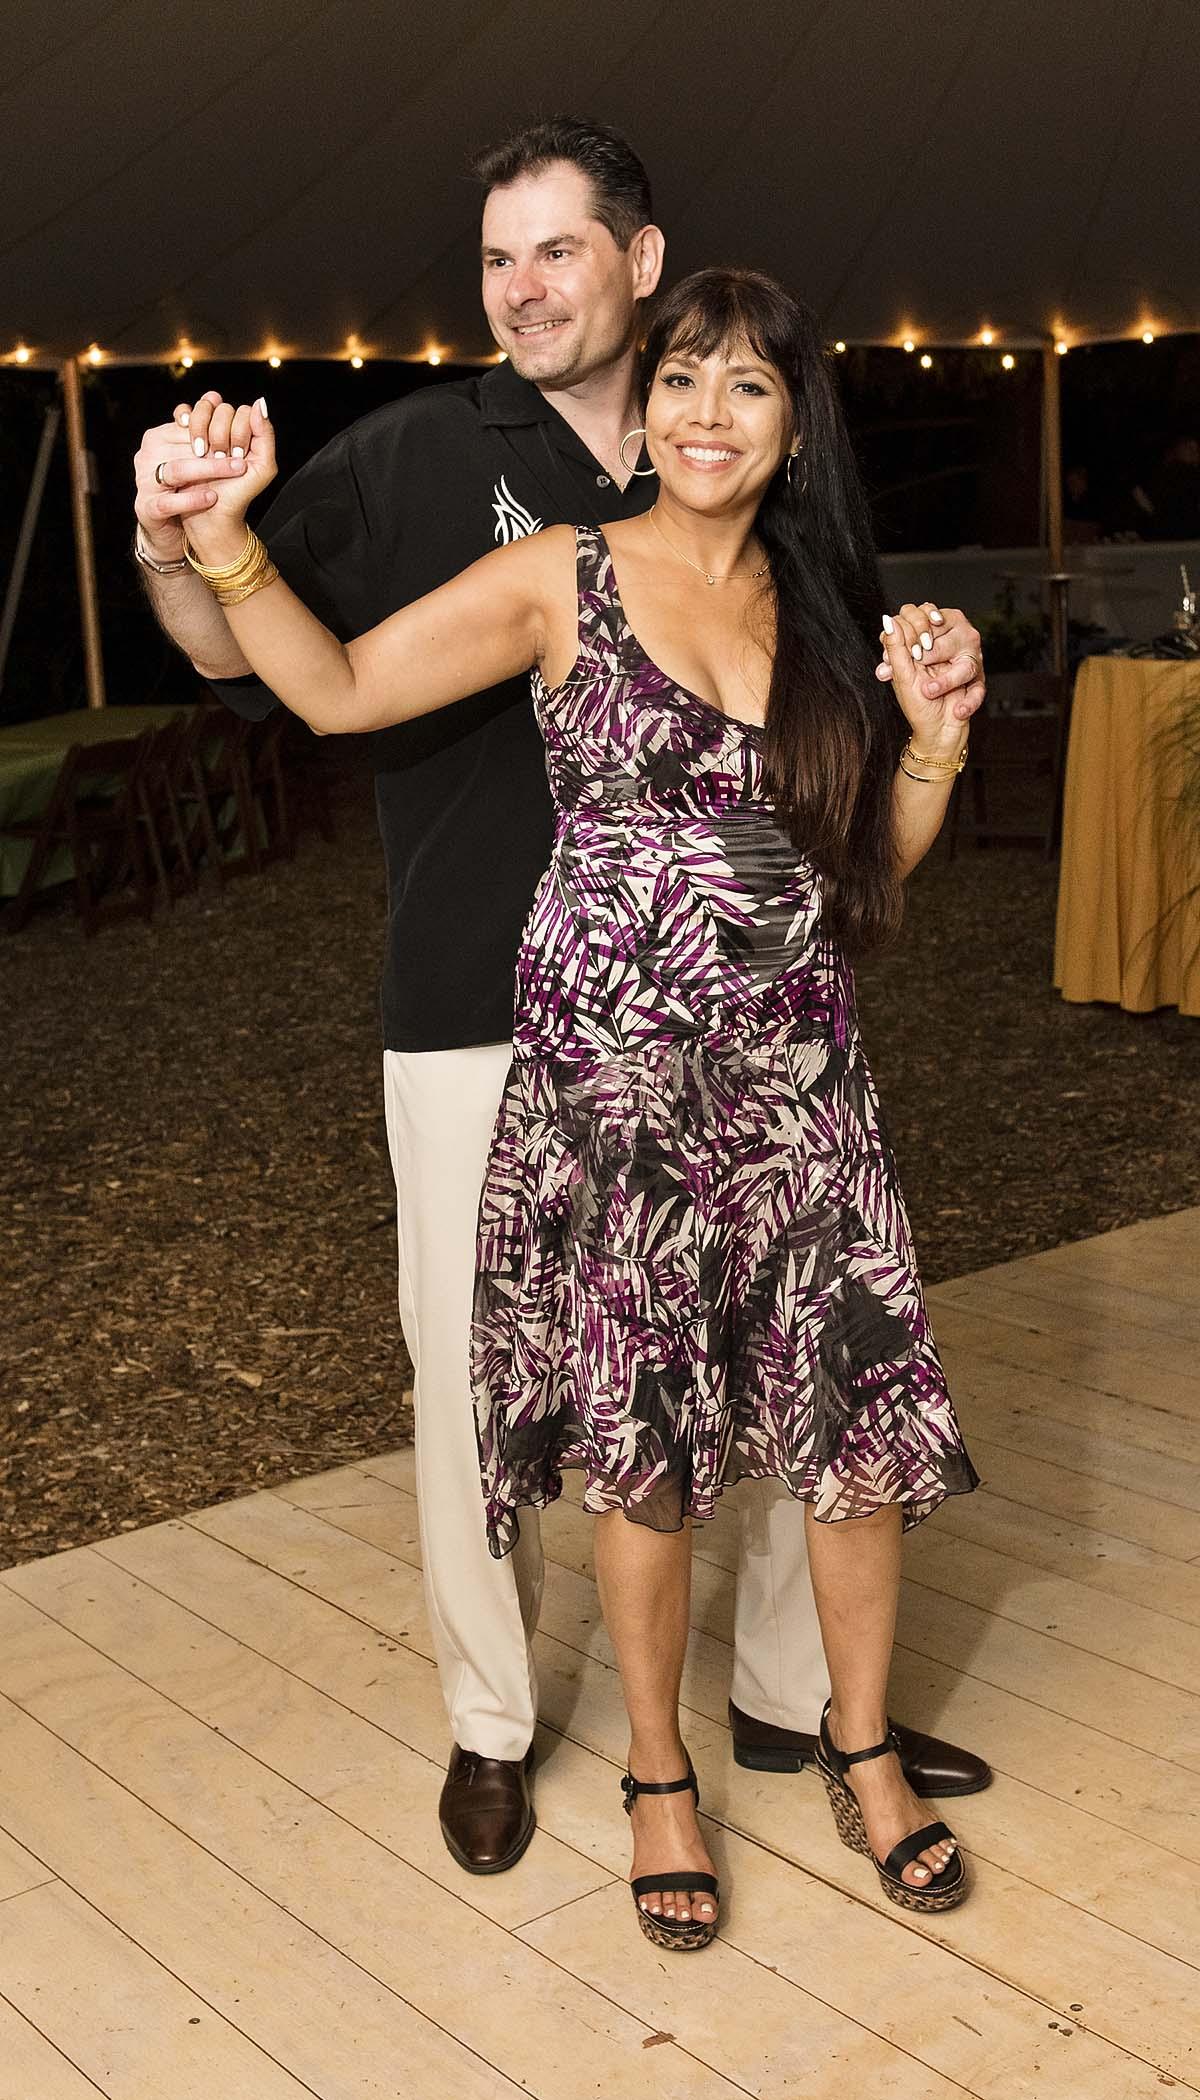 couple-on-dance-floor